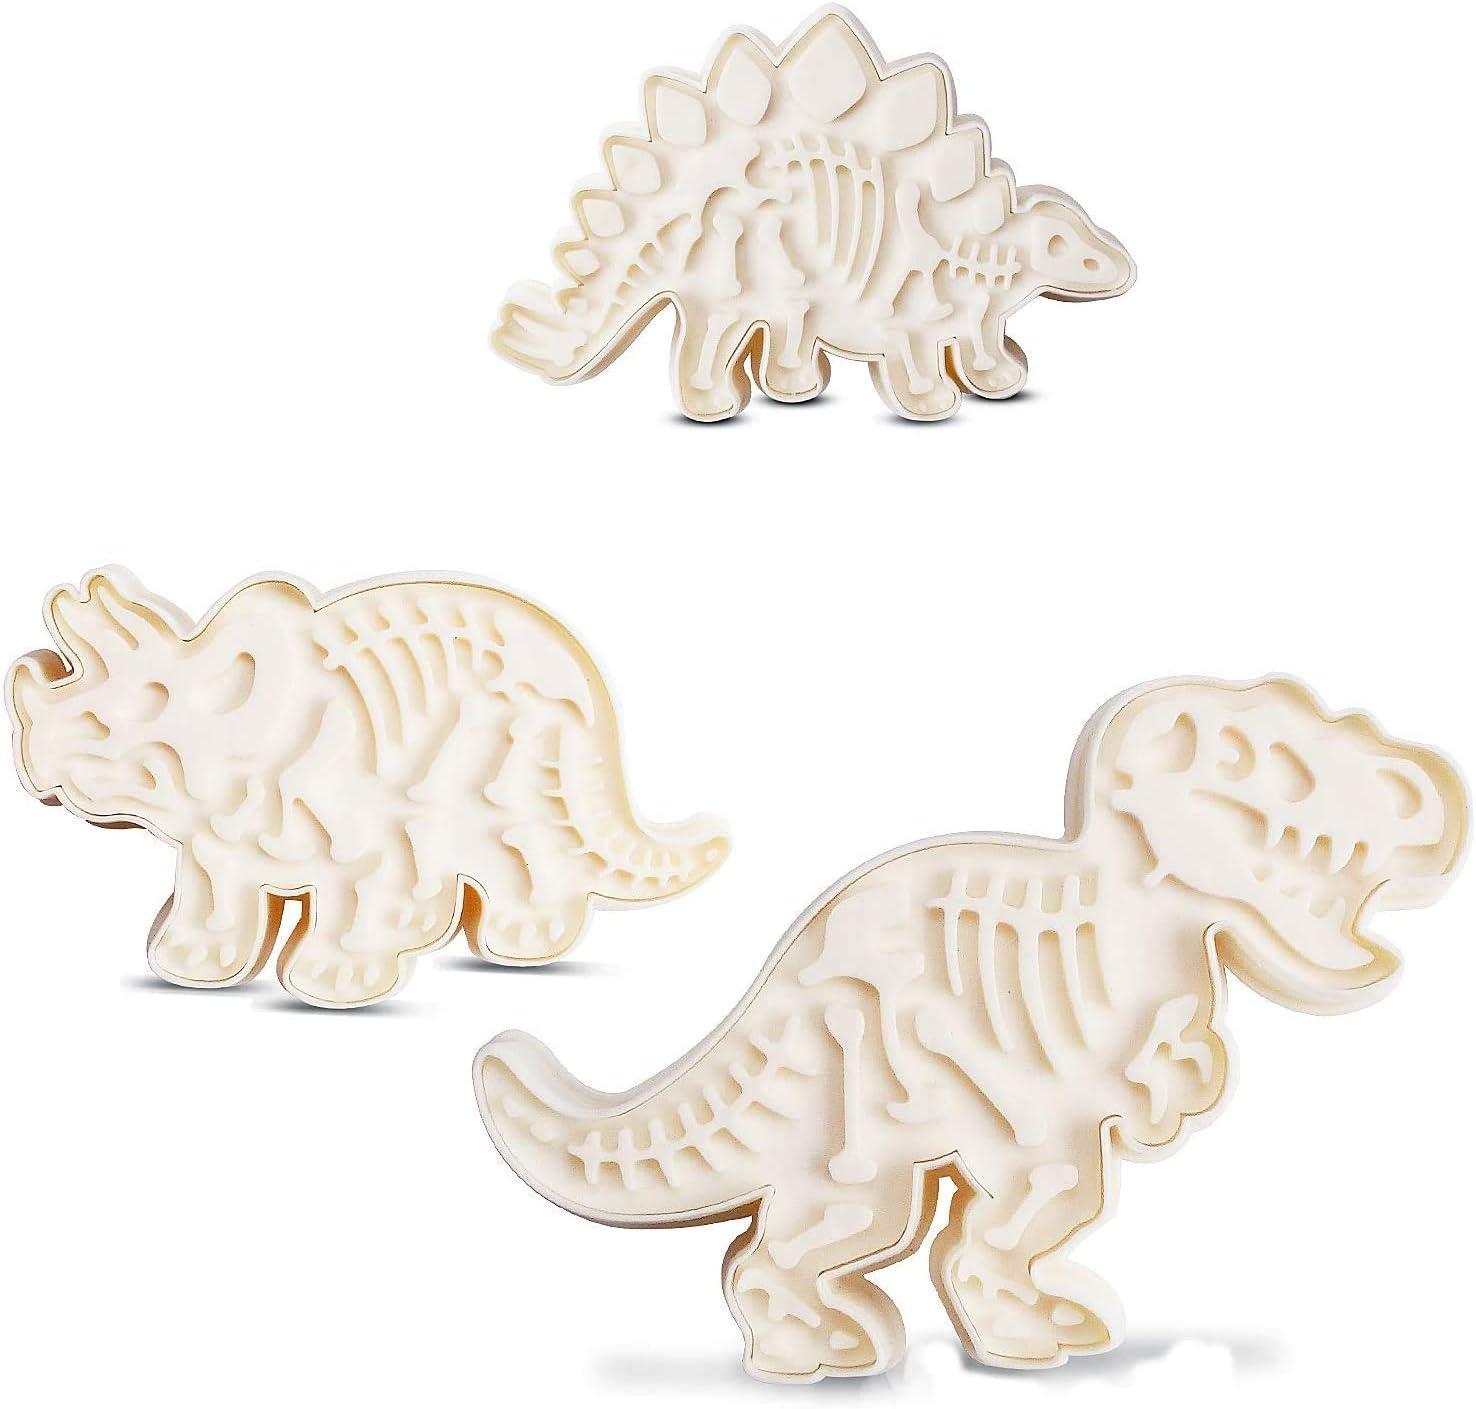 Jurassic Dinosaur Cookie Molds 3 Dinosaur Fossil Cookie Cutters Set Of 6Pcs PVC Stegosaurus Tyrannosaurus Rex Triceratops Molds